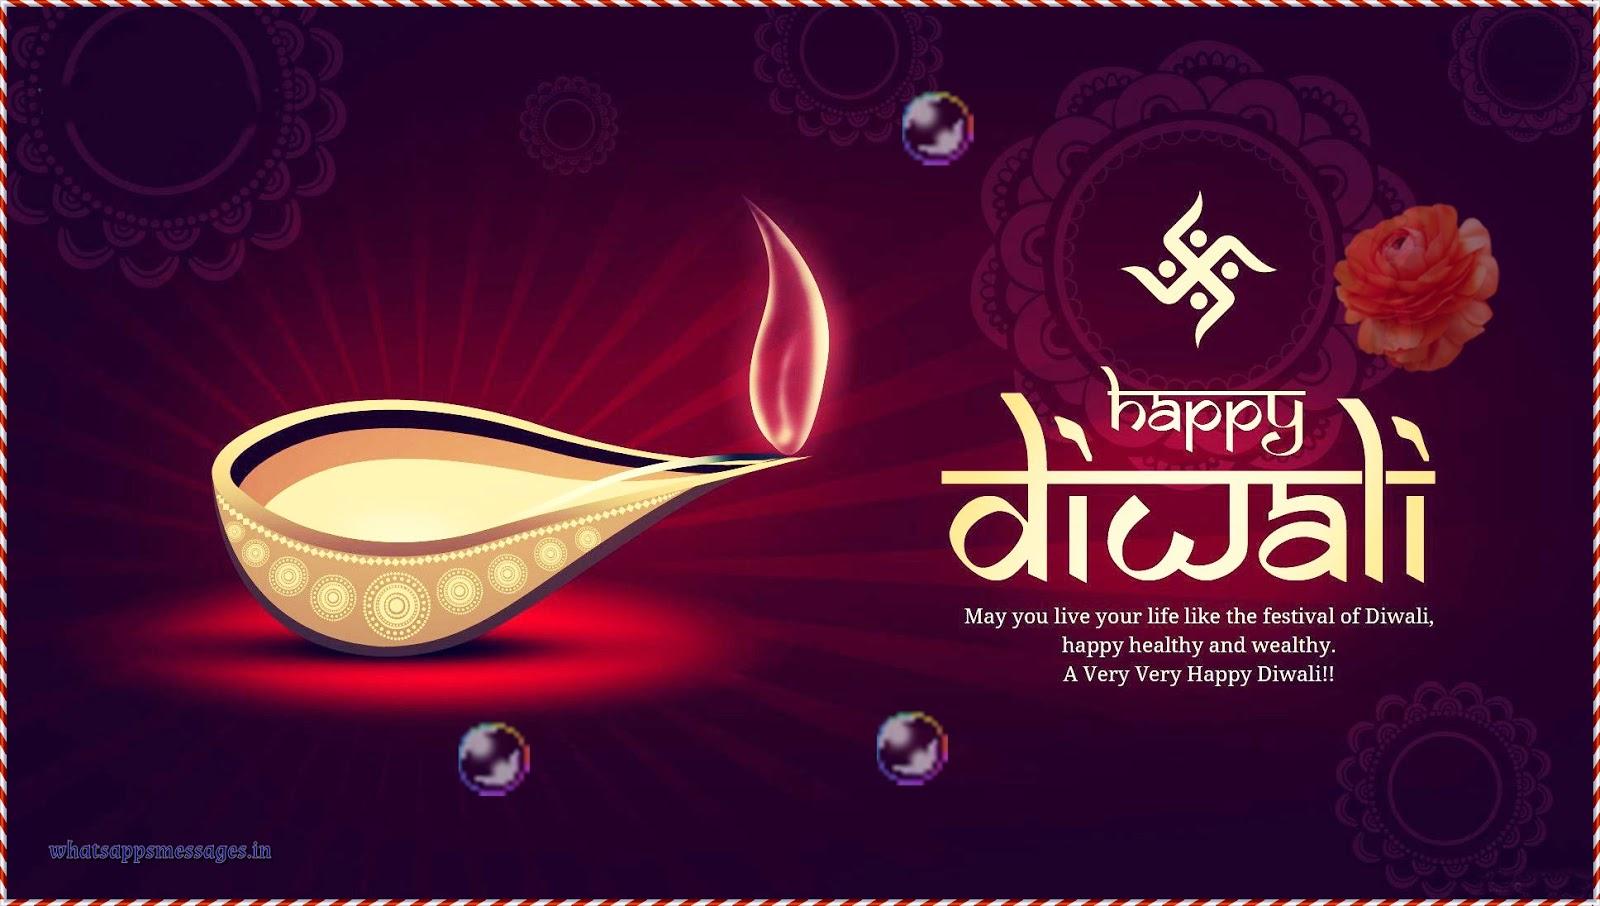 Diwali funny message whatsapp messages diwali funny smsdeepawali funny messagesbest funny sms for diwalidiwali funny m4hsunfo